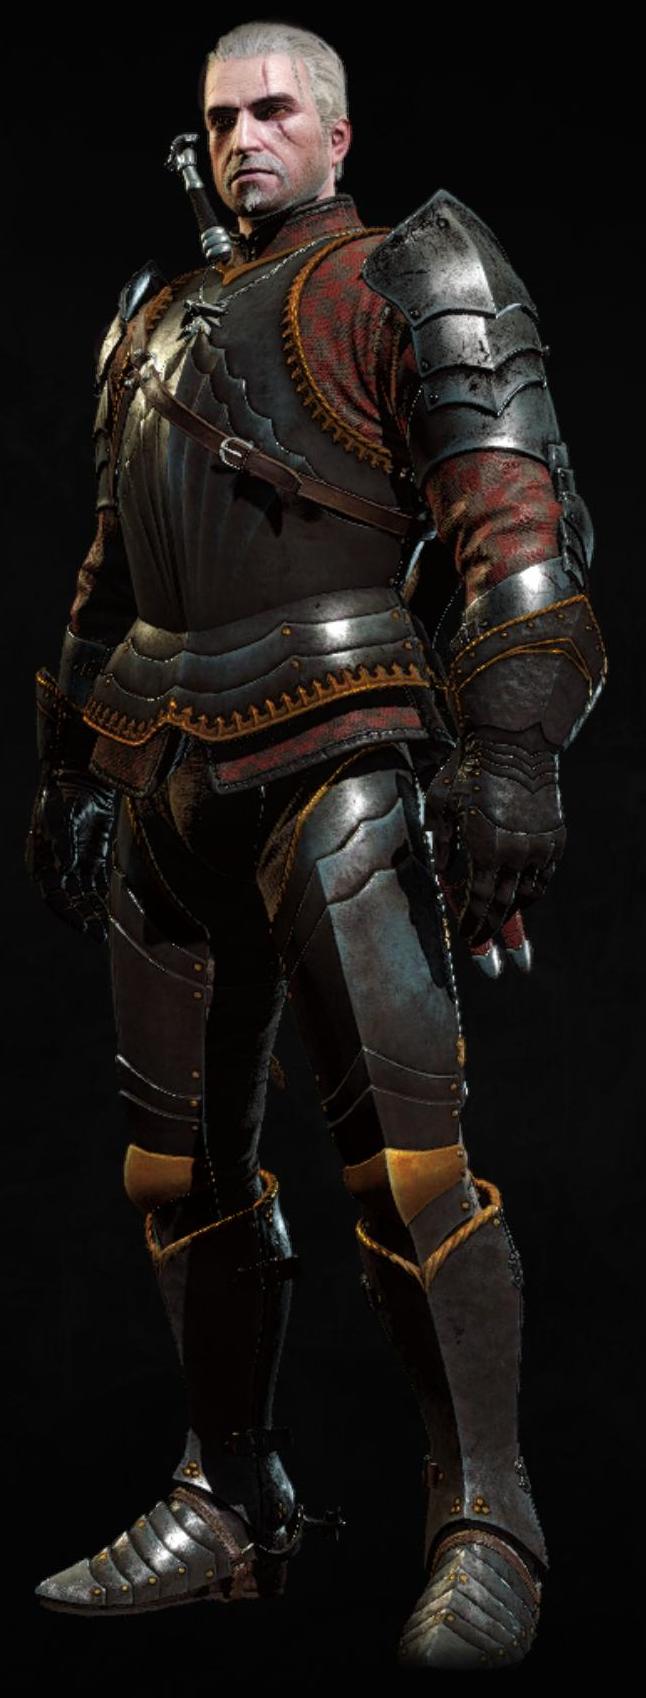 Tw3 armor Toussaint knight tourney gear.png